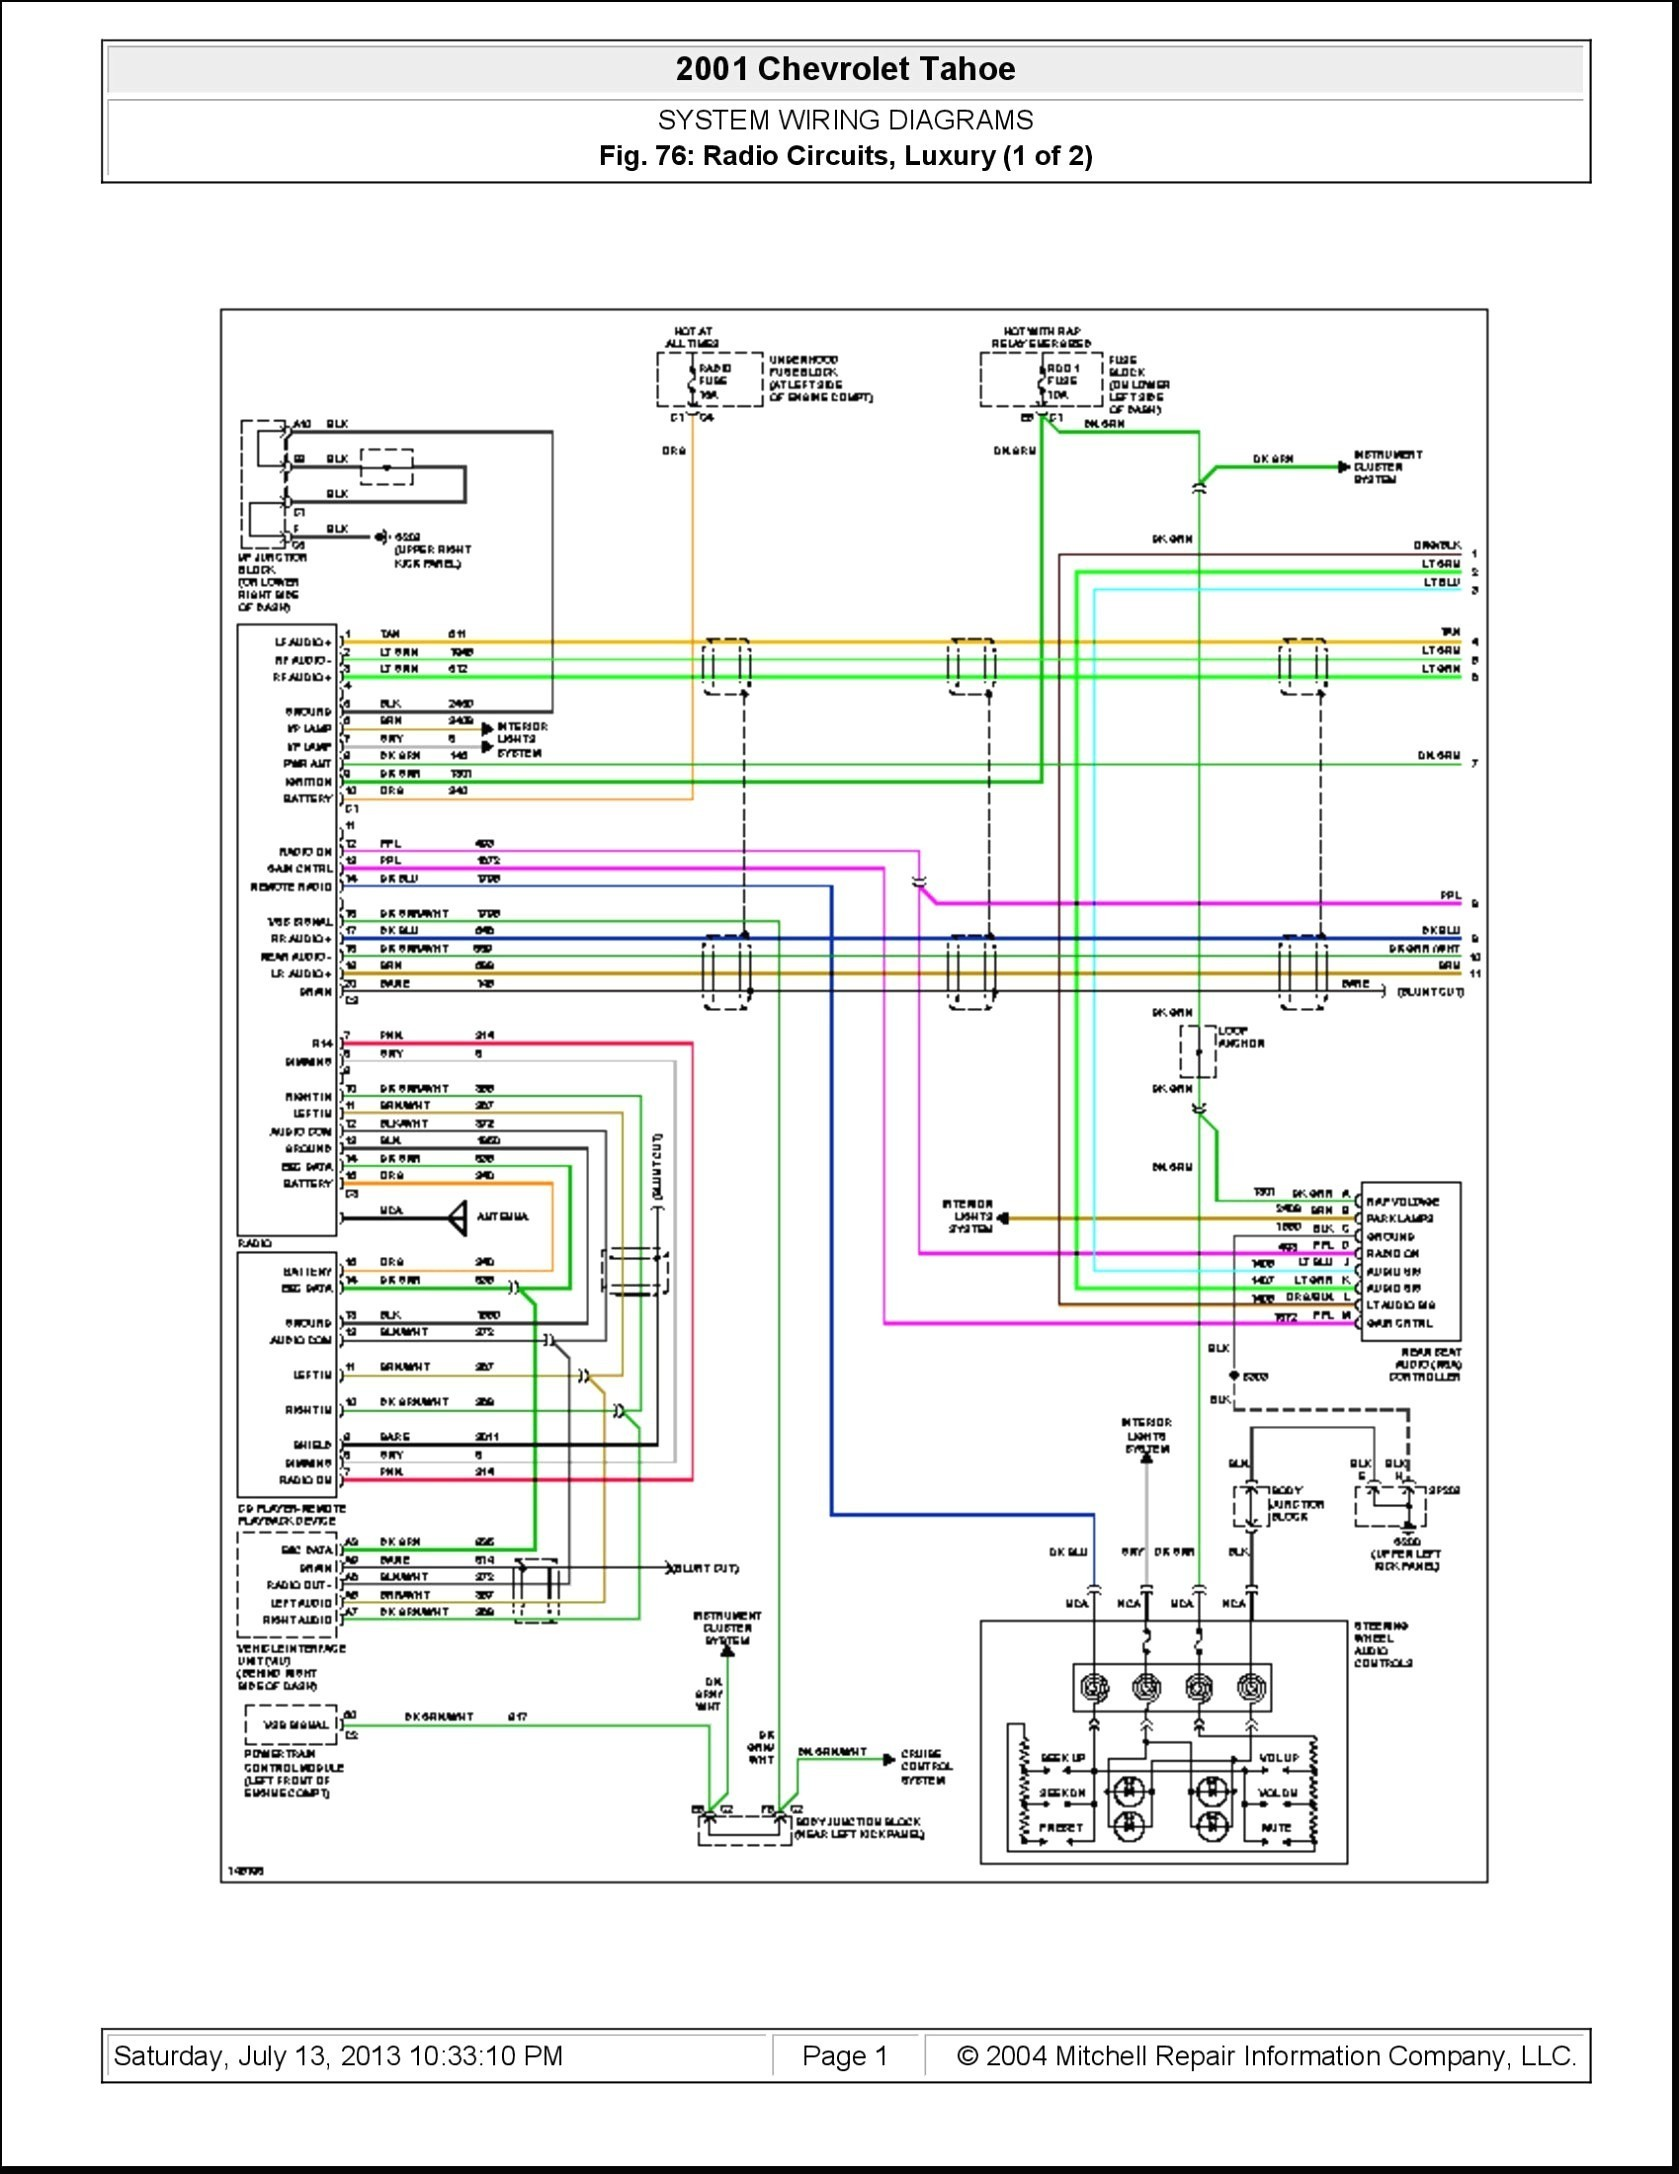 2007 chevy impala radio wiring diagram new wiring diagram image 2004 chevy tahoe radio wiring diagram 57 65 chevy wiring diagrams cheapraybanclubmaster Image collections